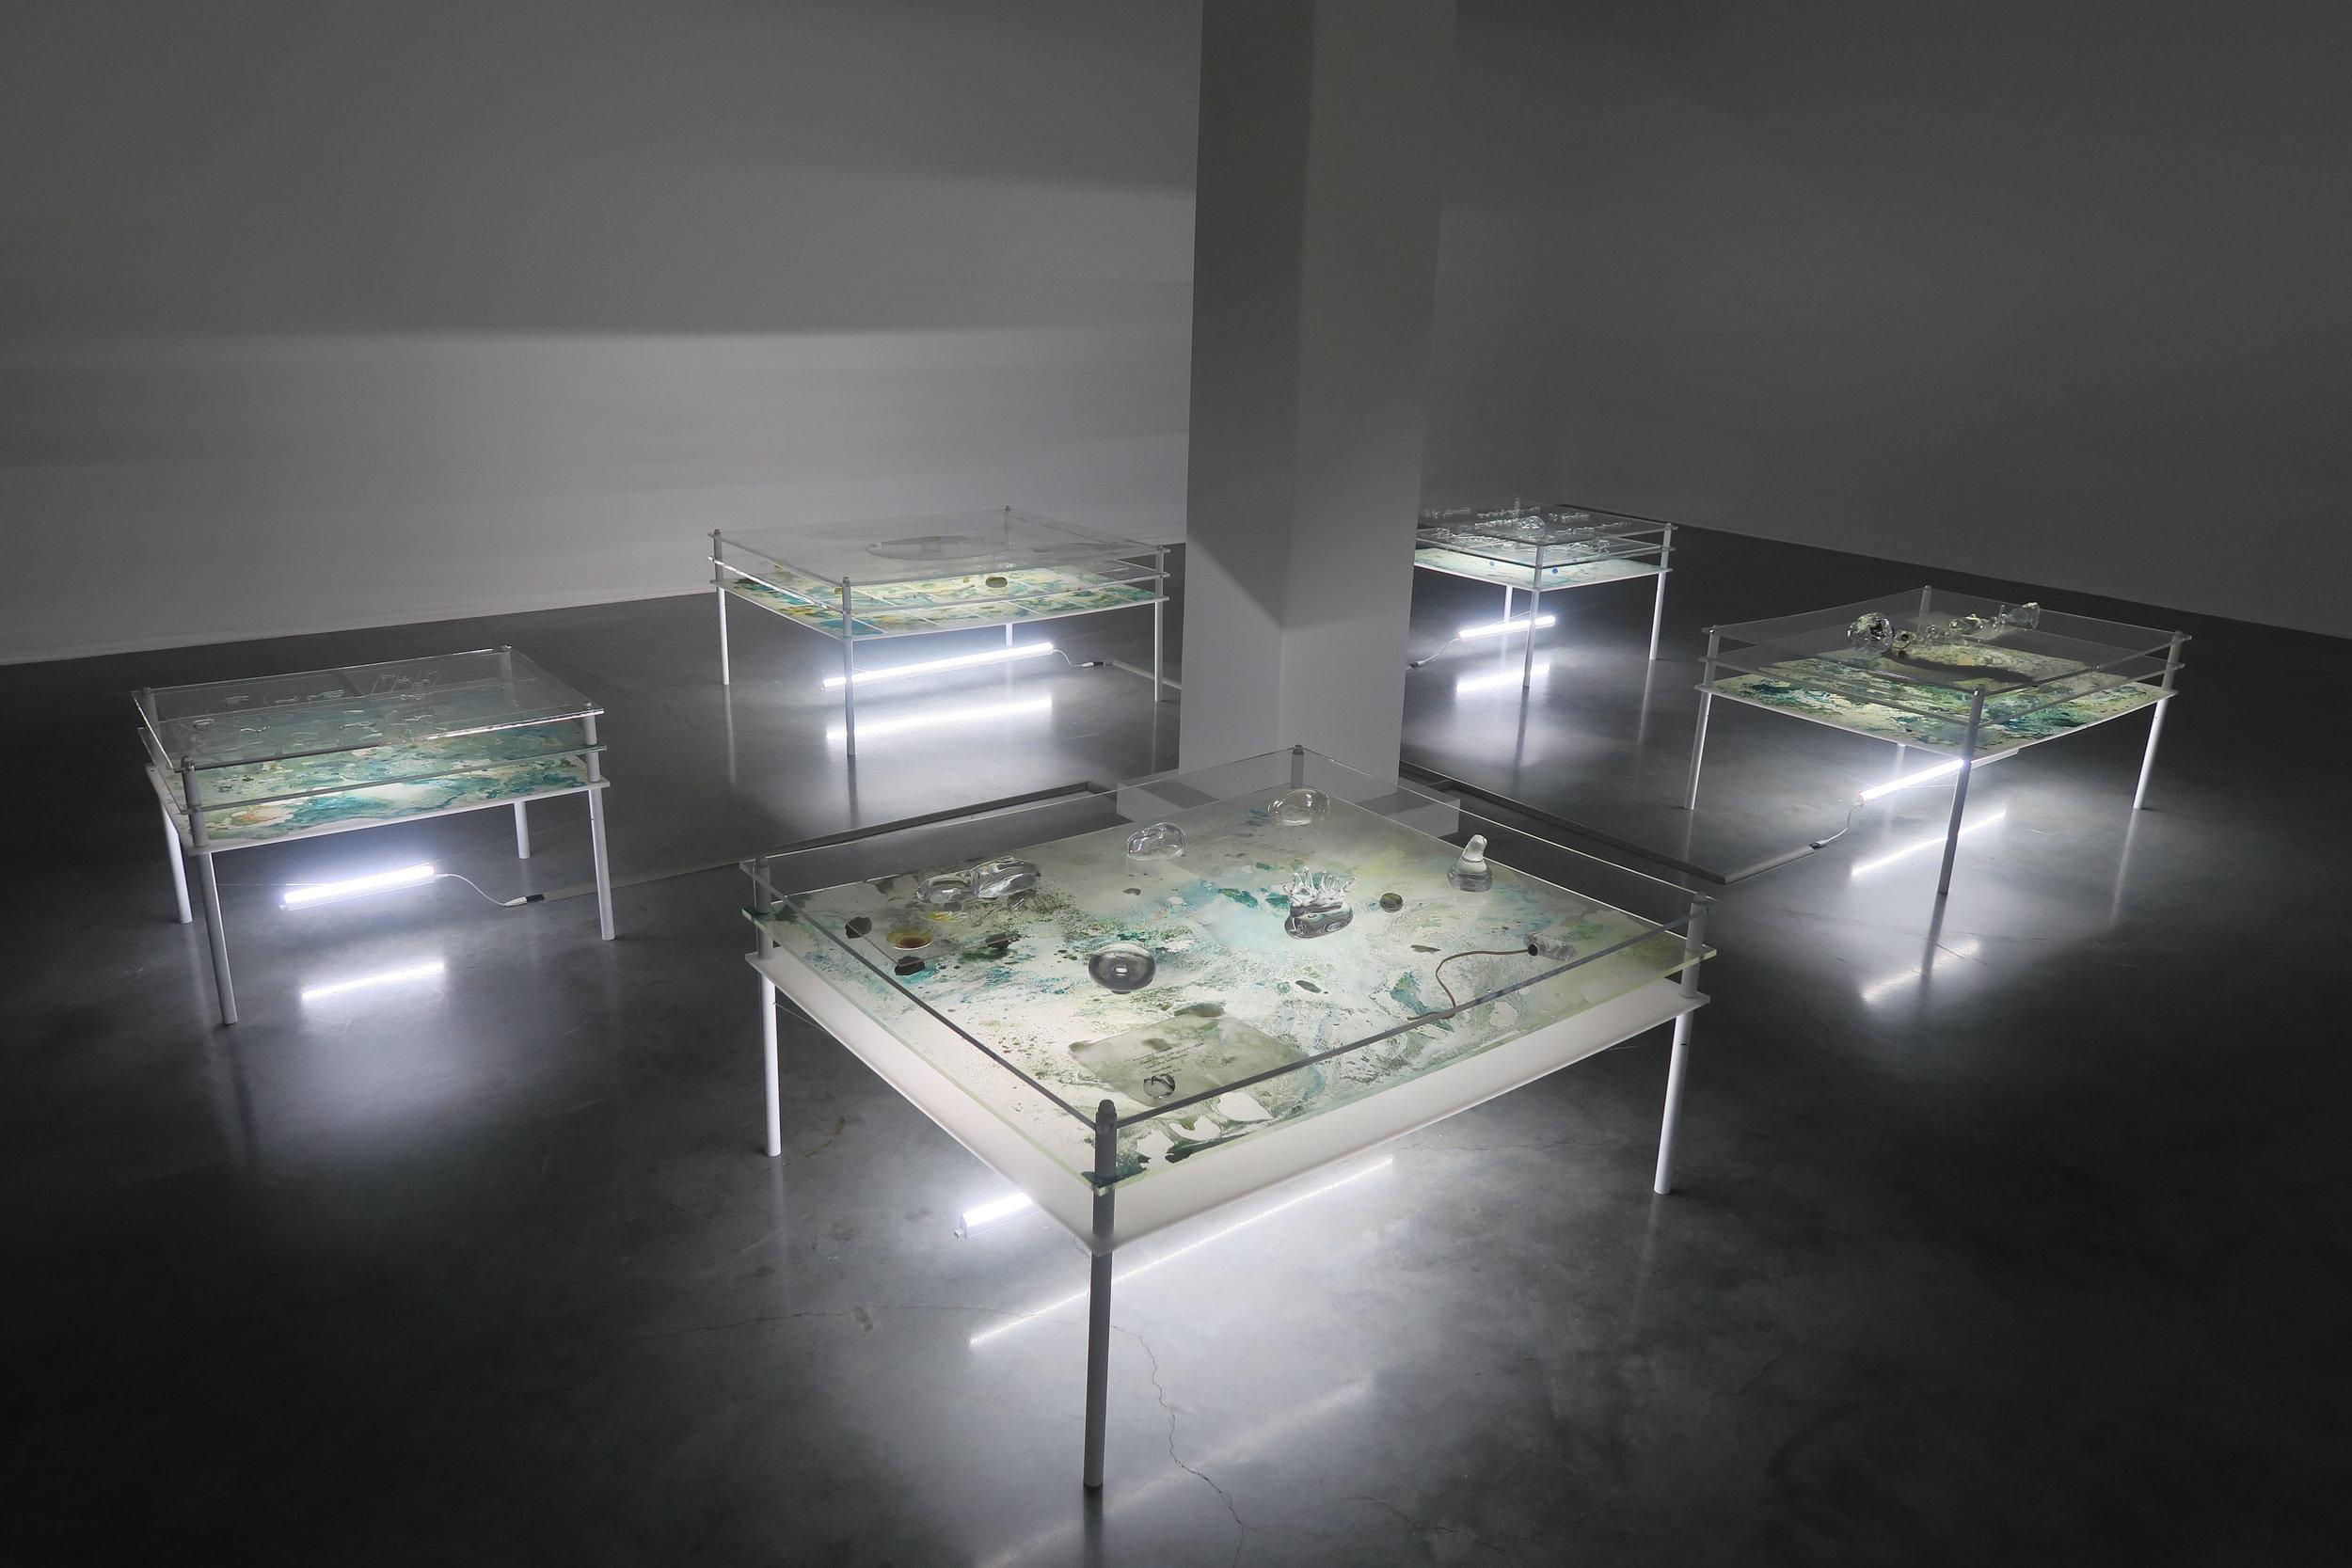 Tuomas Aleksander Laitinen,  Dossier of Osmosis , 21st Biennale of Sydney, 2018.